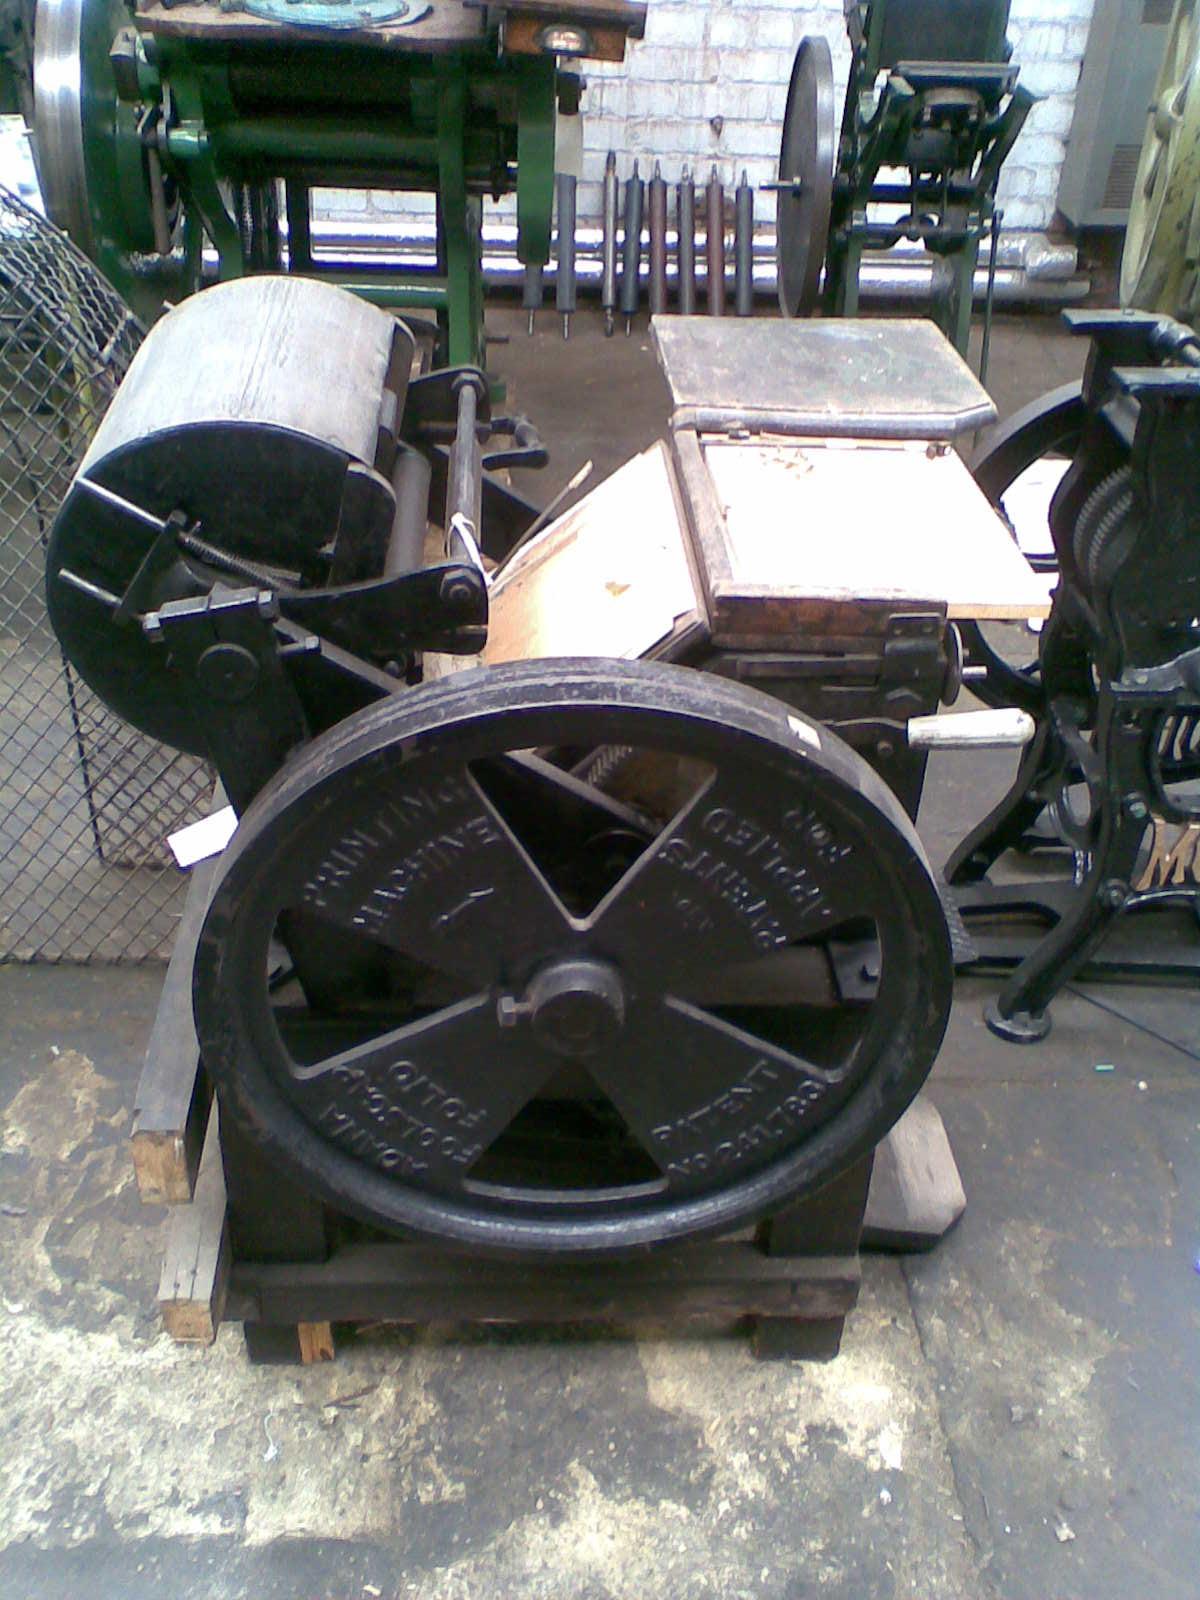 Adana Foolscap Folio Treadle Press (Bradford Industrial Museum)